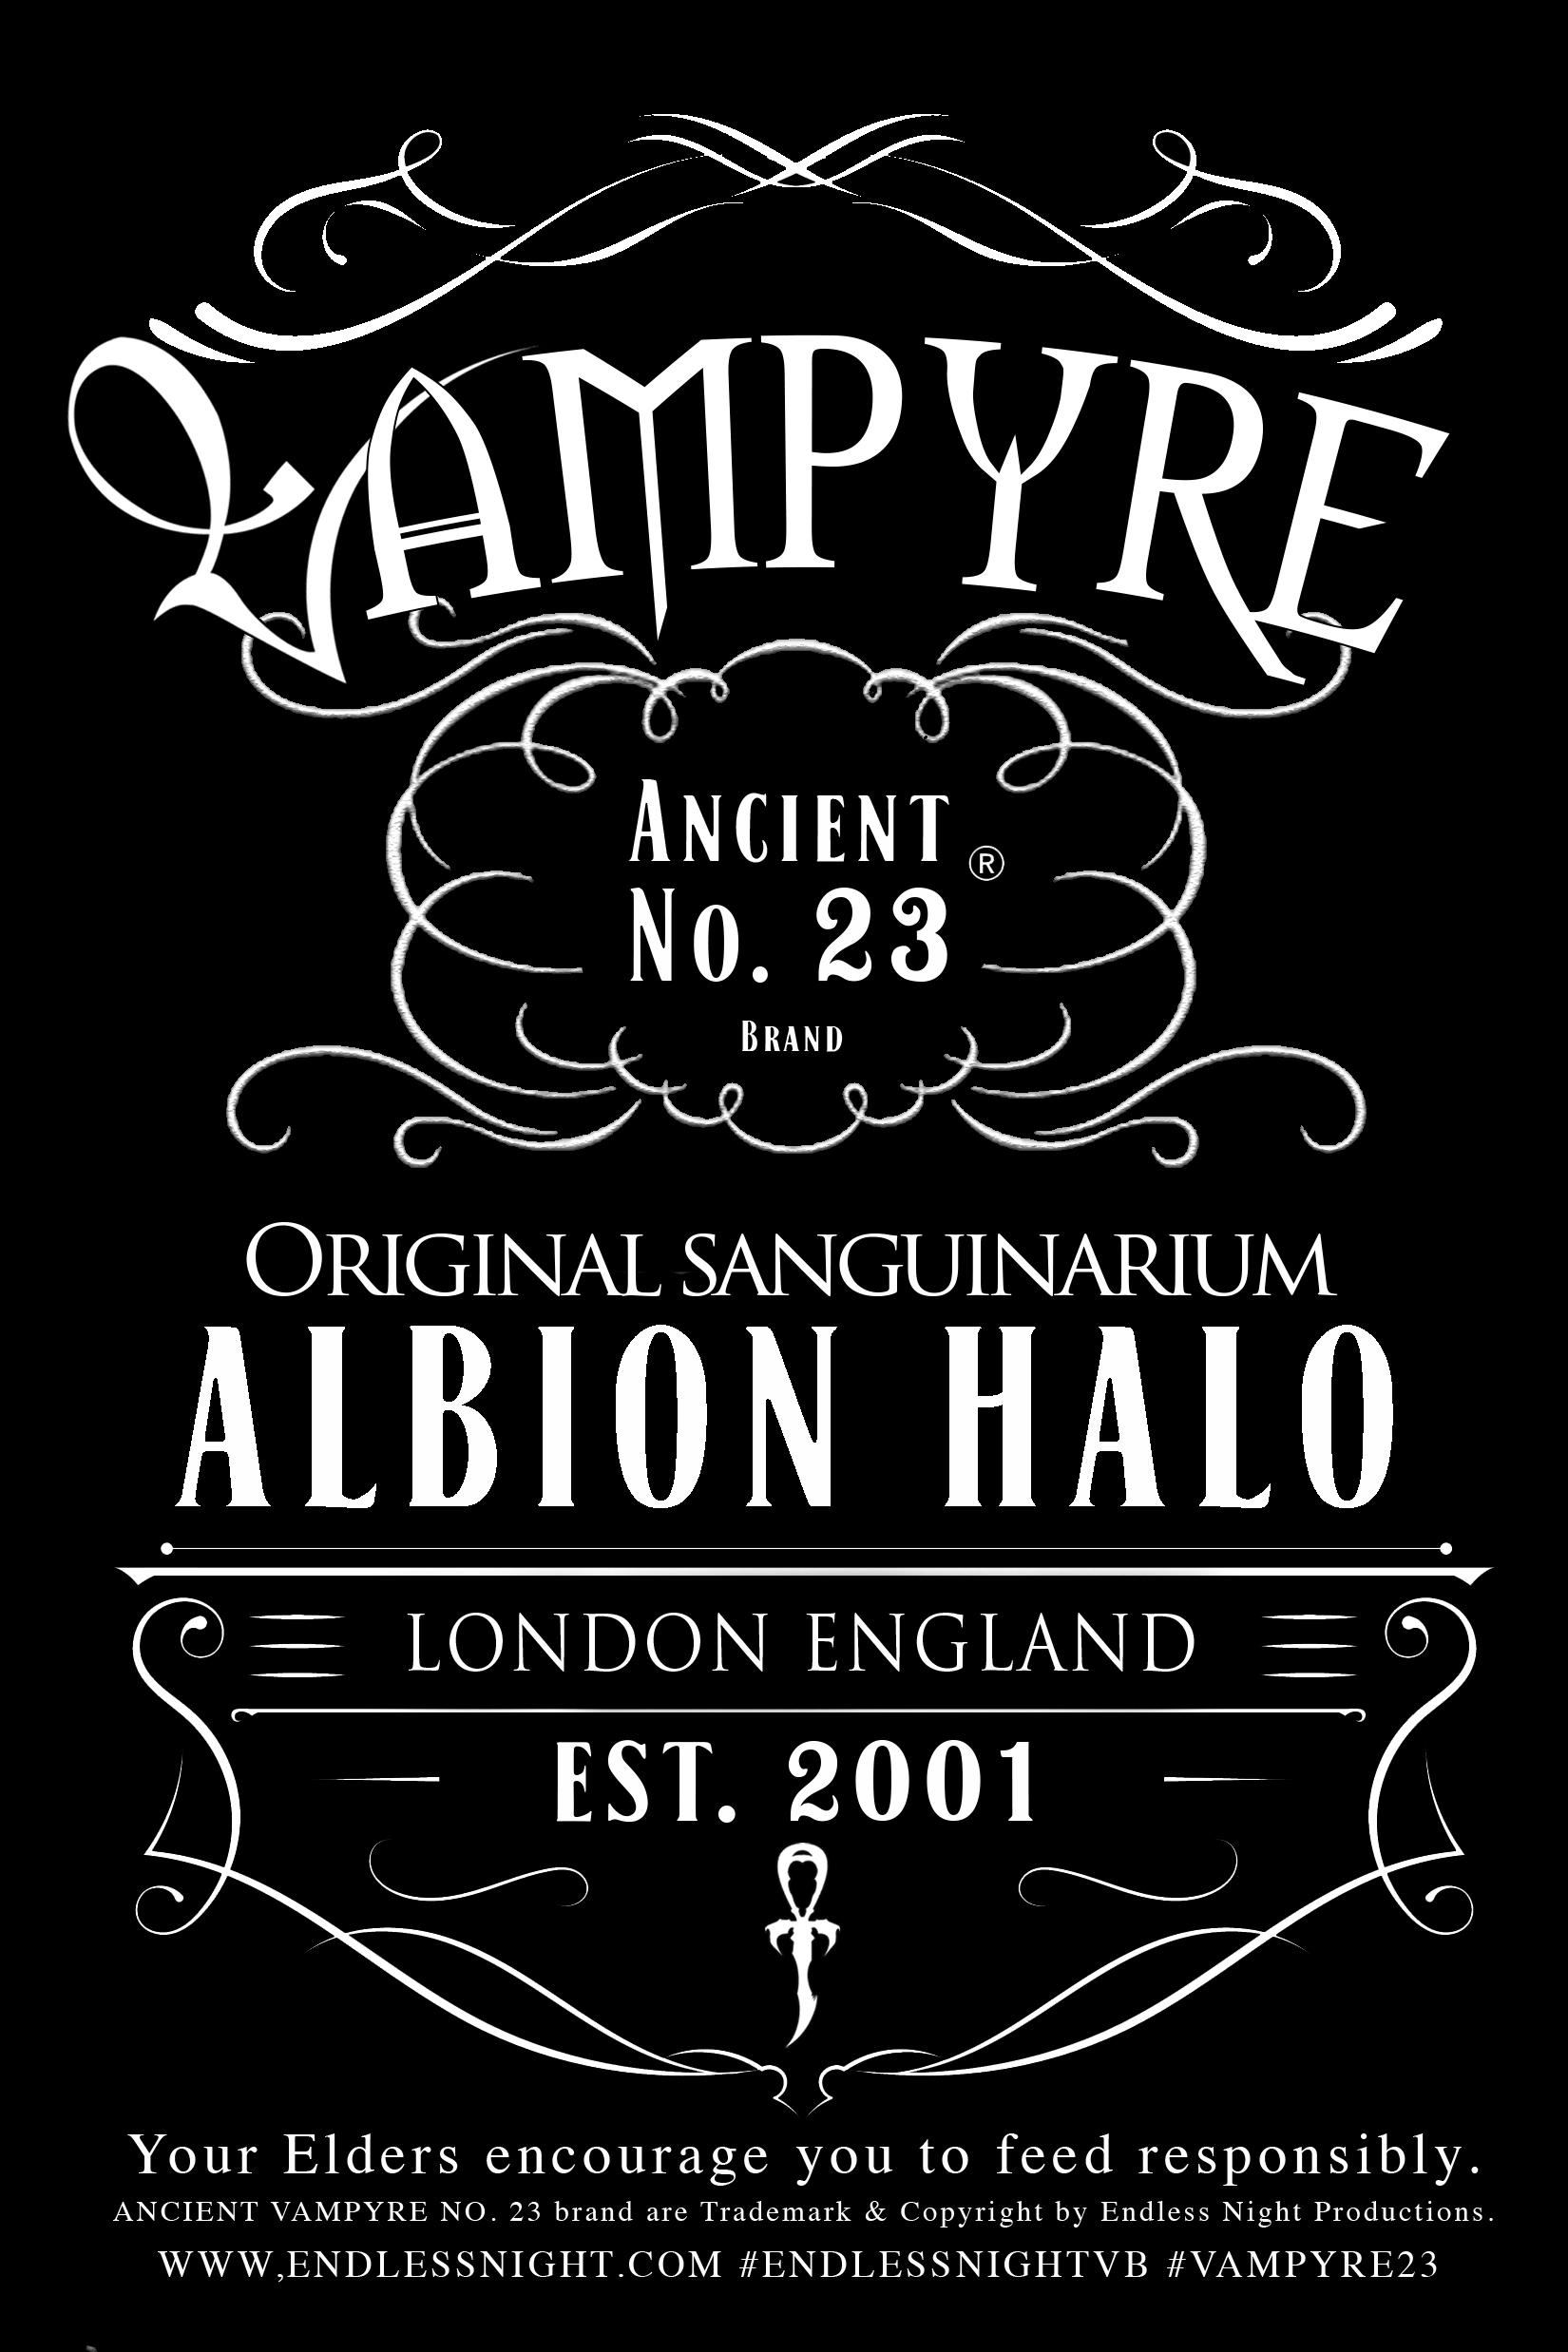 OriginalVampyre23-AlbionHalo.jpg